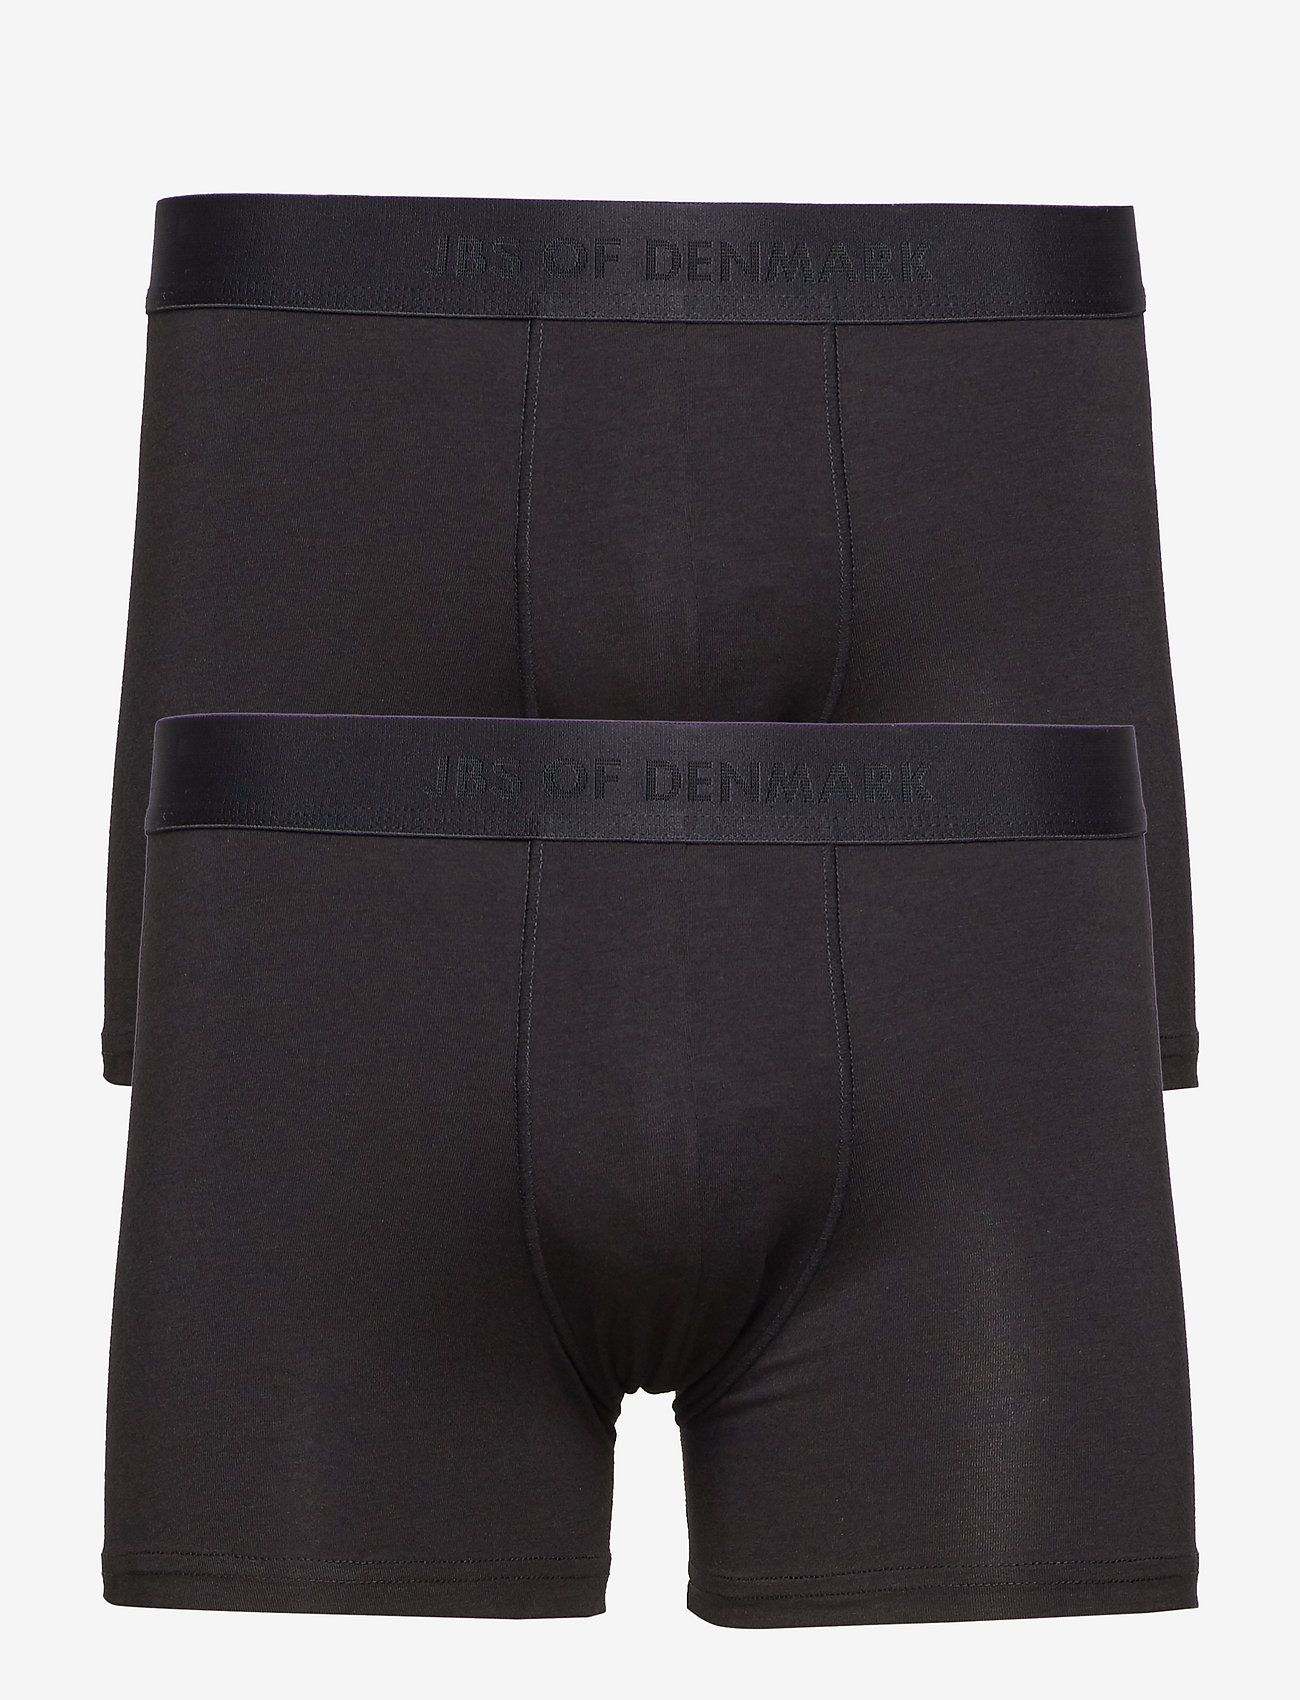 JBS of Denmark - JBS of Denmark, 2-pack bamboo - underwear - black